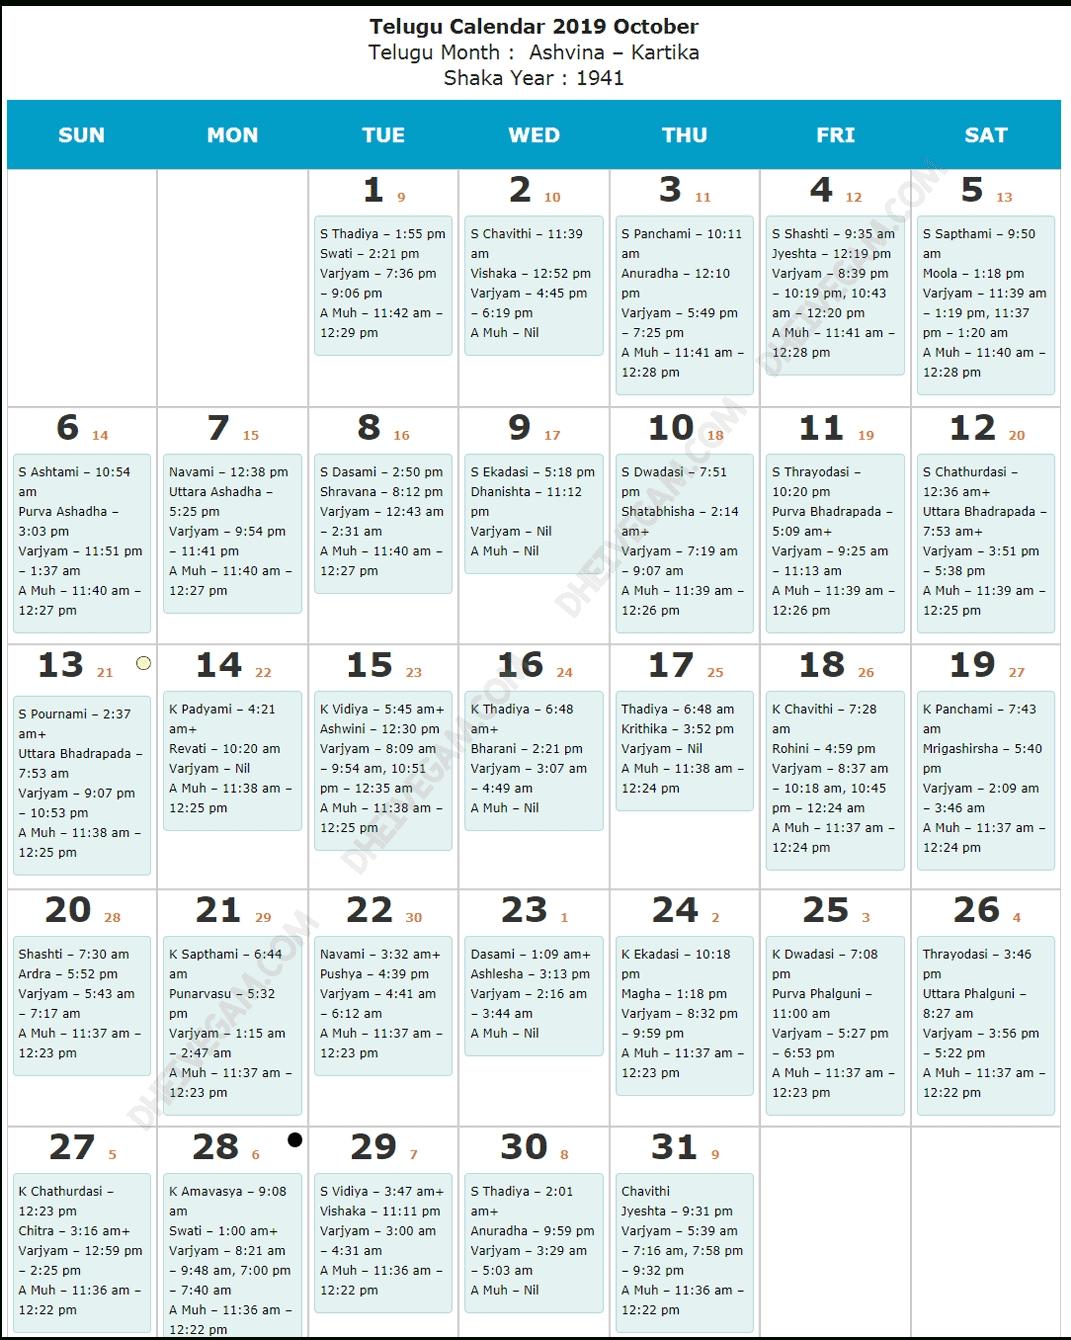 Telangana Telugu Calendar September 2019 | Mulugu Calendar 2019 May Tamil Monthly Calendar 2021 October